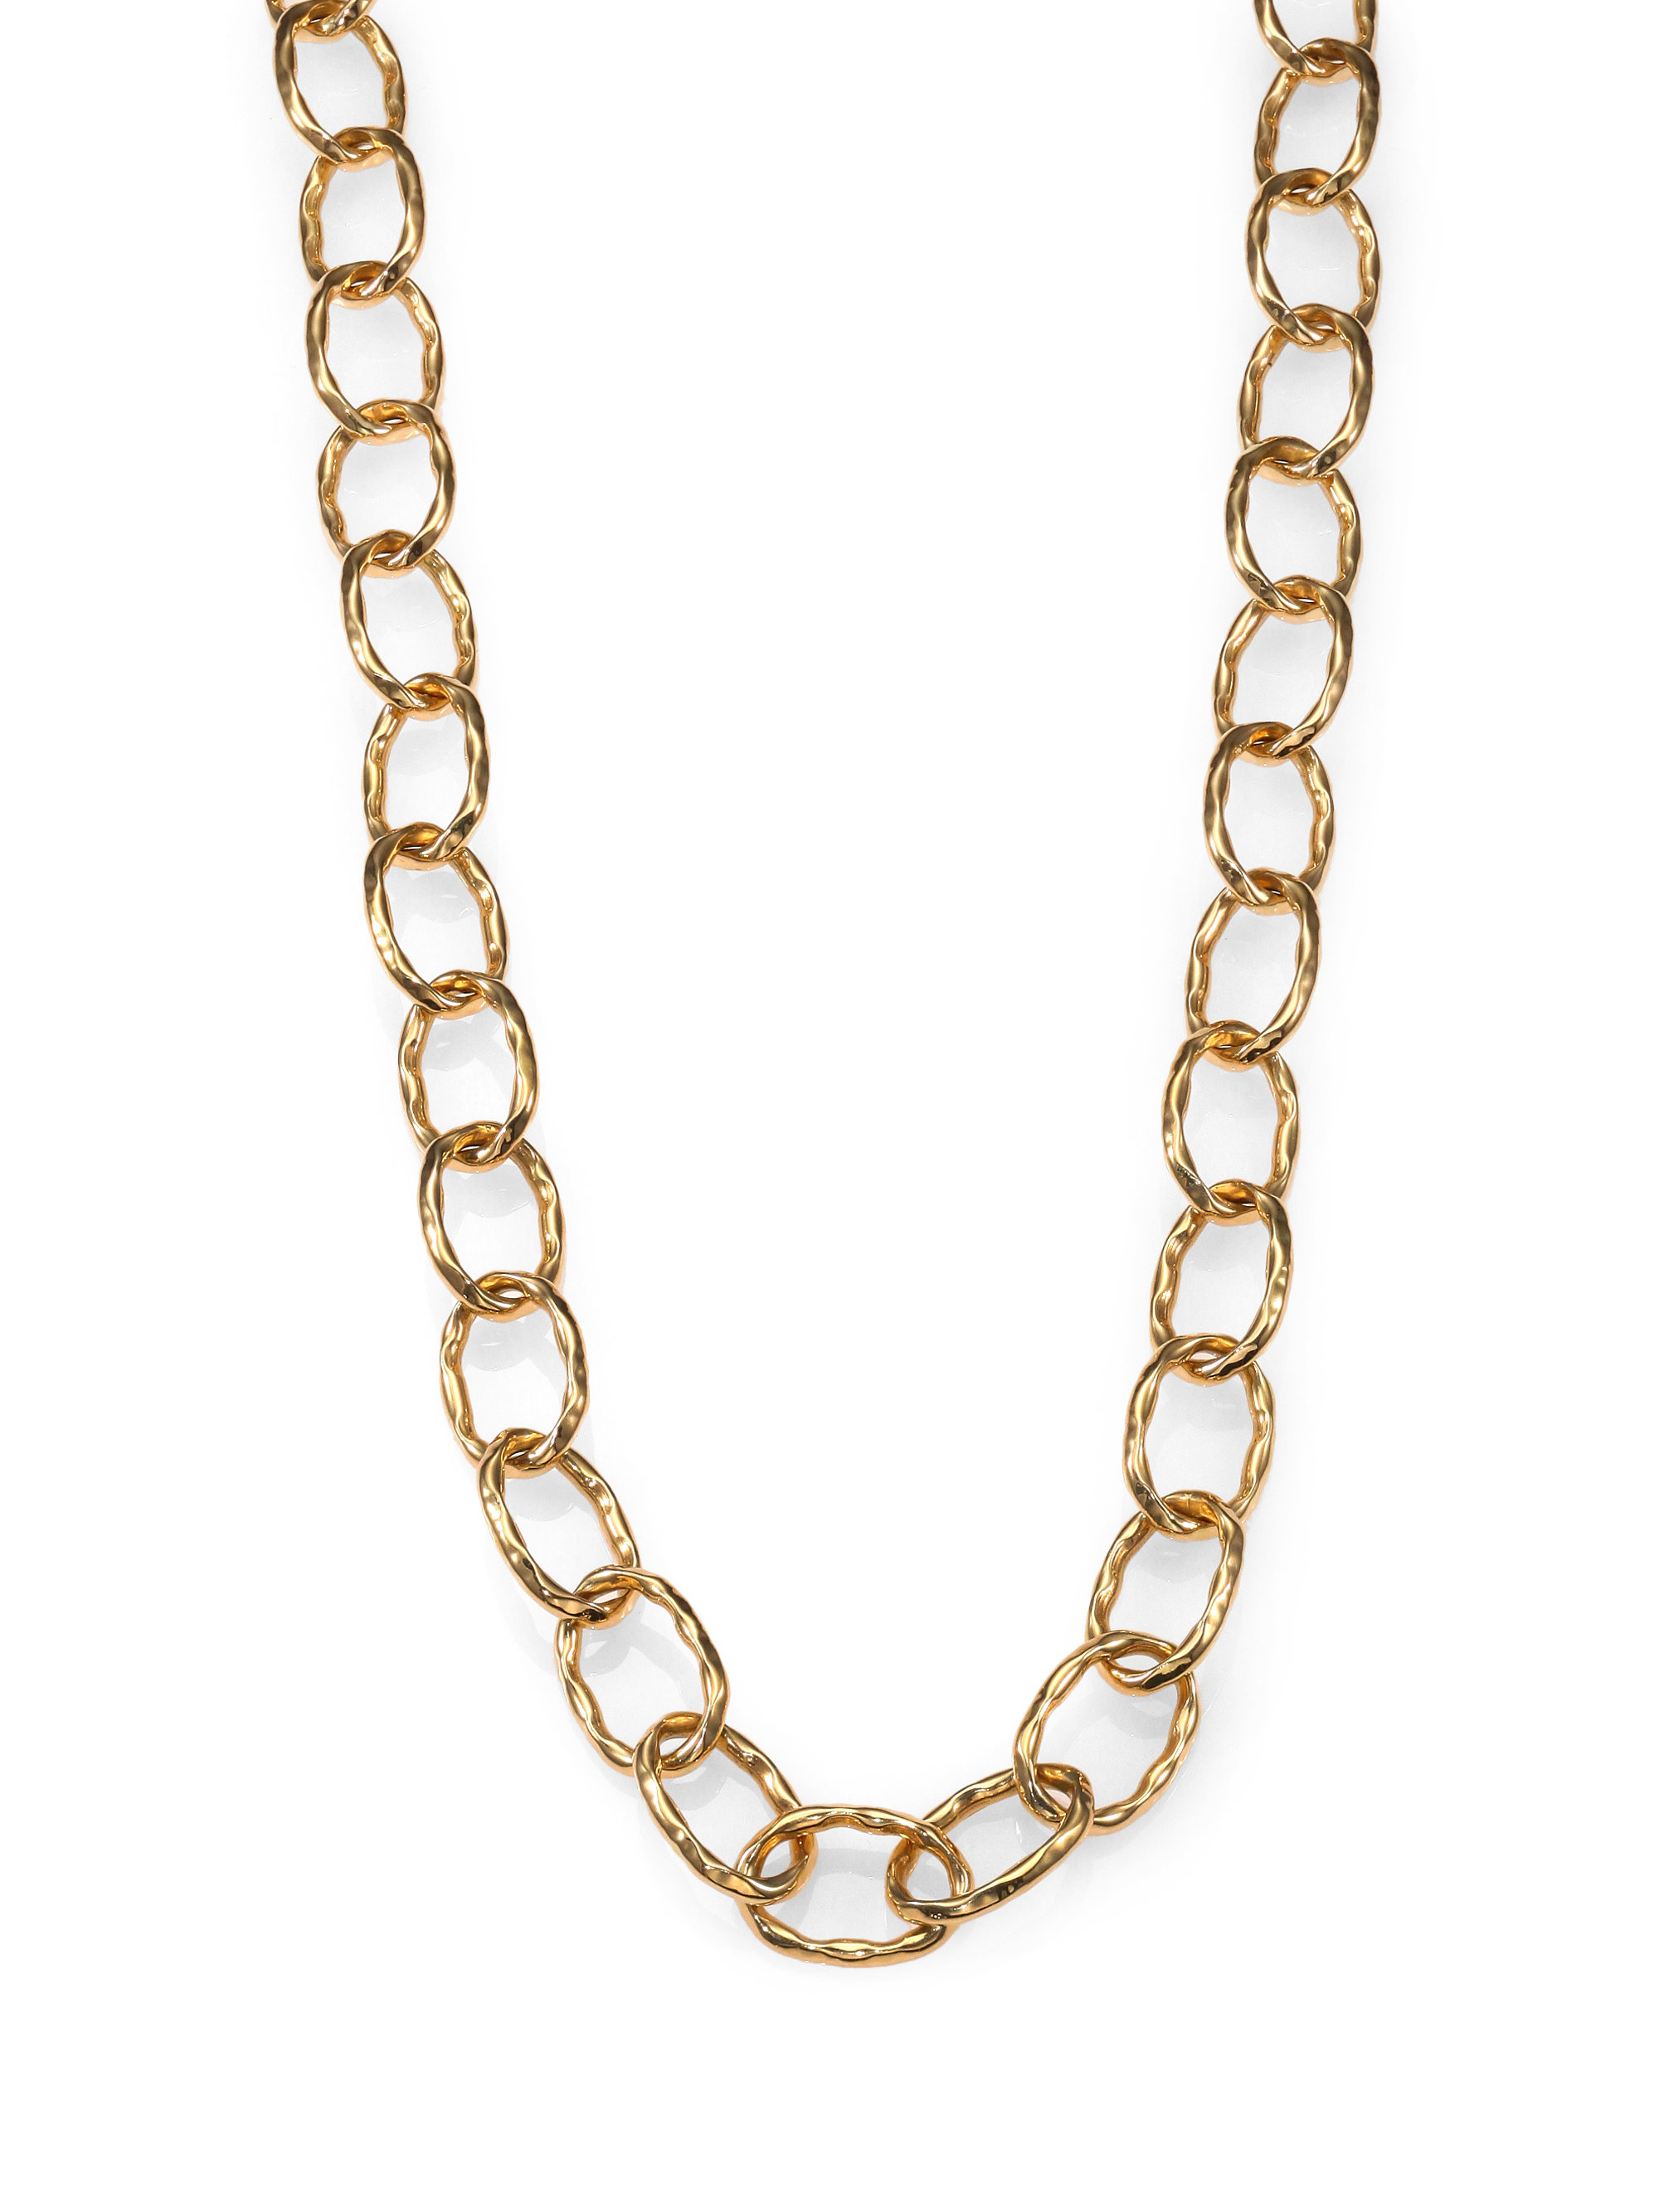 roberto coin 18k gold hammered chain link necklace in gold. Black Bedroom Furniture Sets. Home Design Ideas